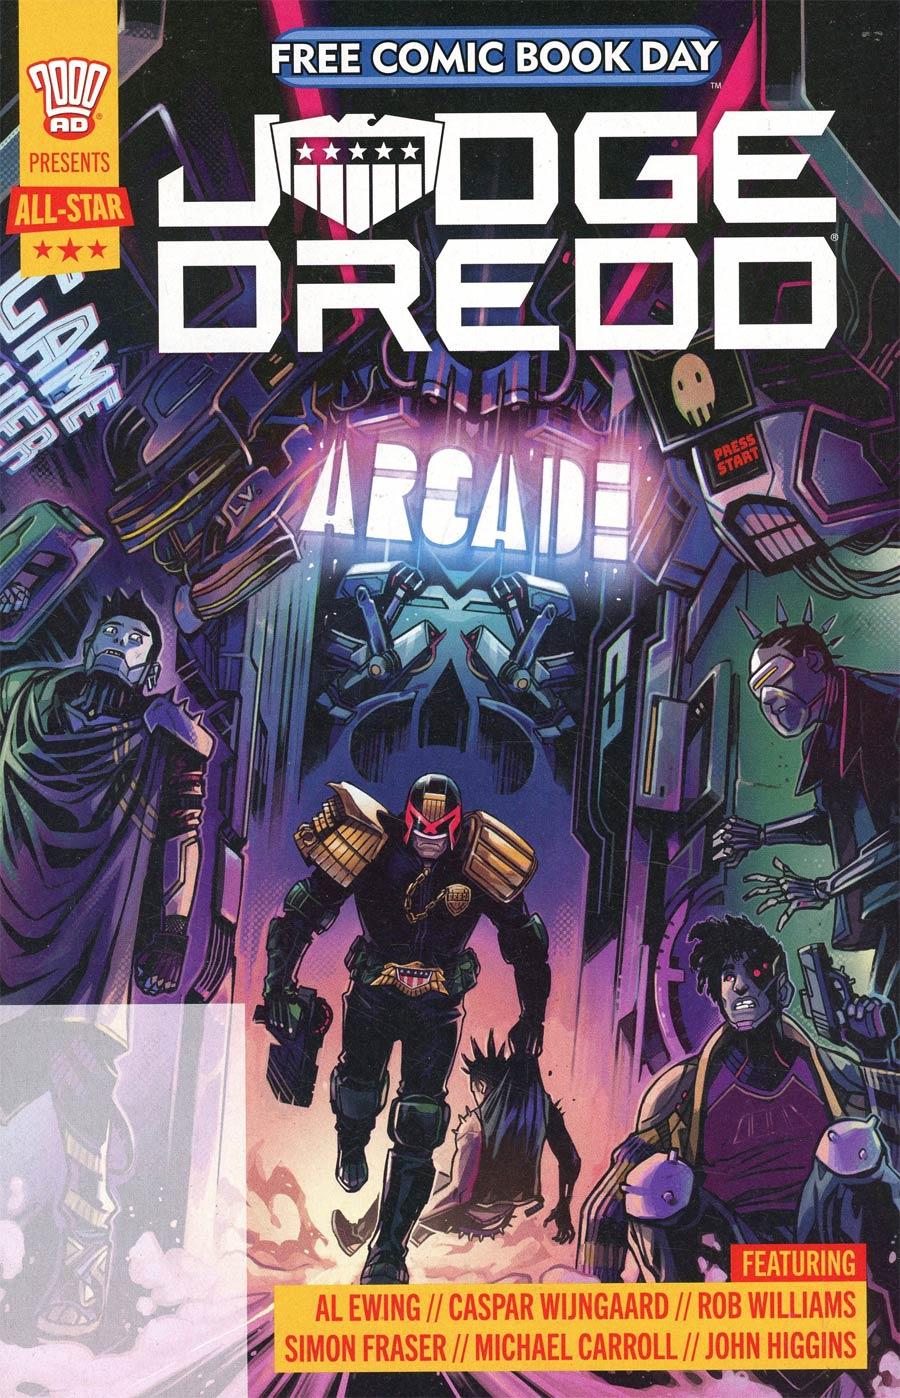 2000 AD Presents All-Star Judge Dredd #1 FCBD 2021 Edition